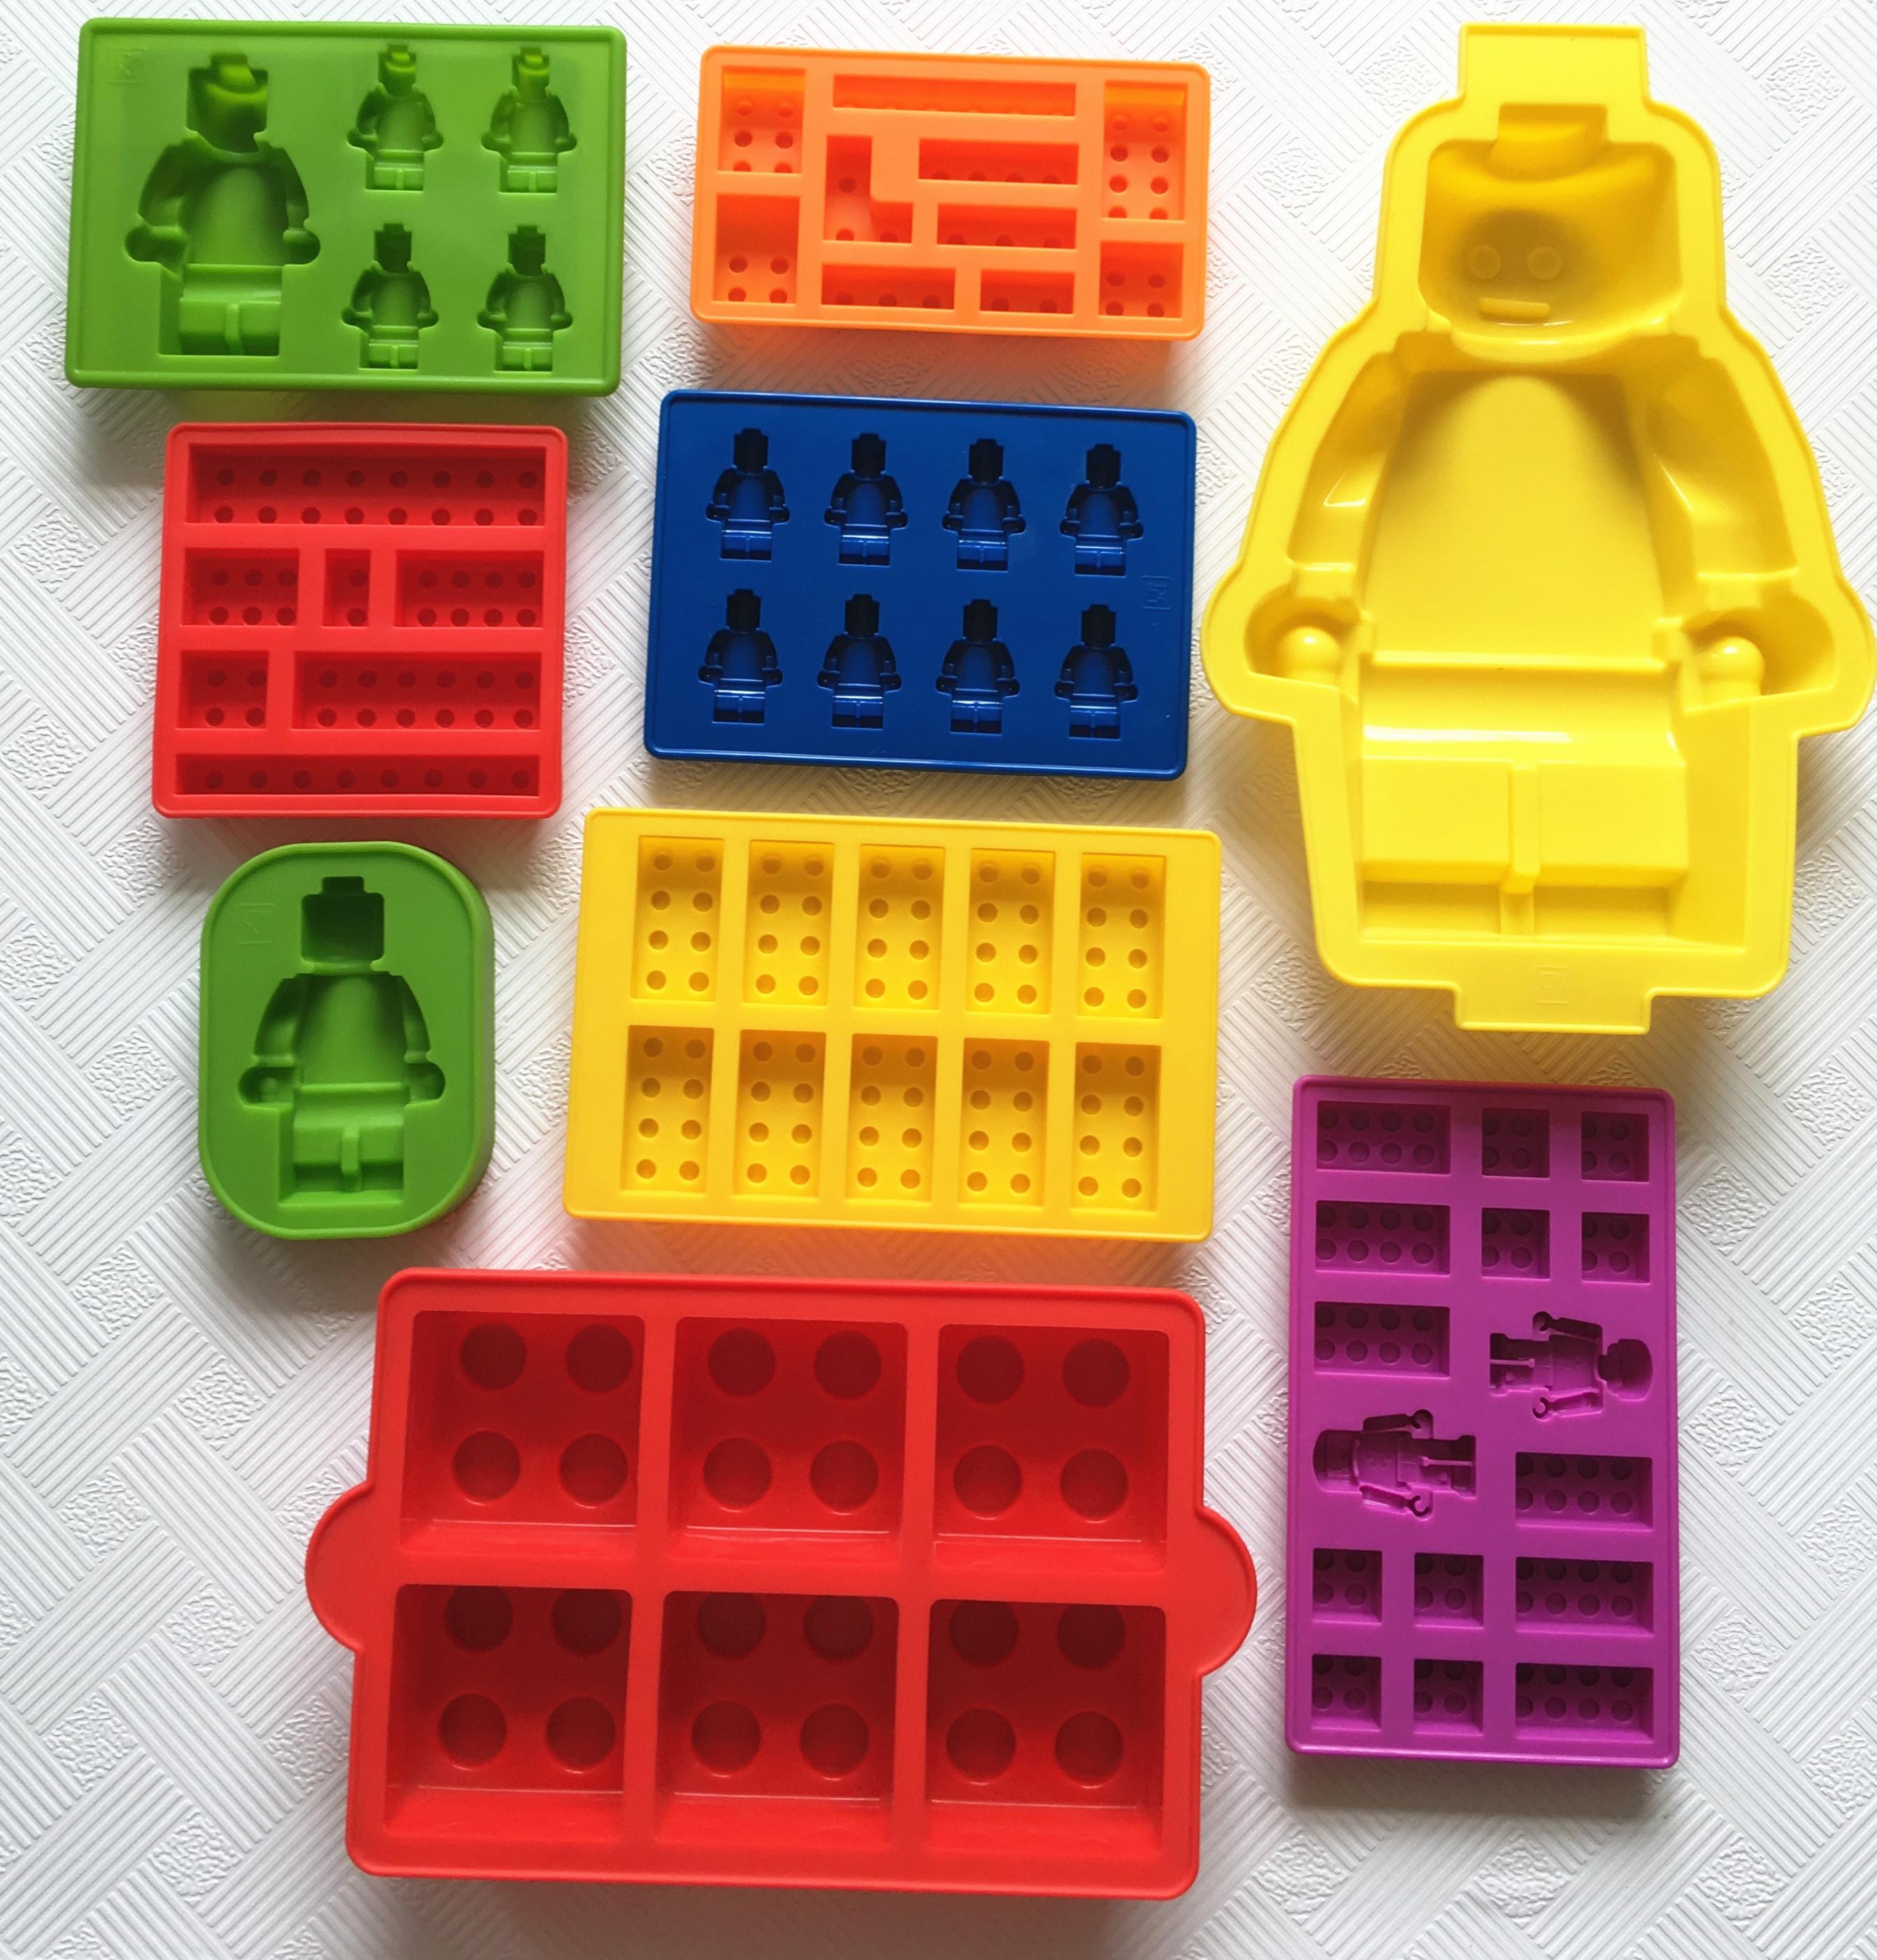 China Lego Molds Supplier Lego Mold Manufacturer